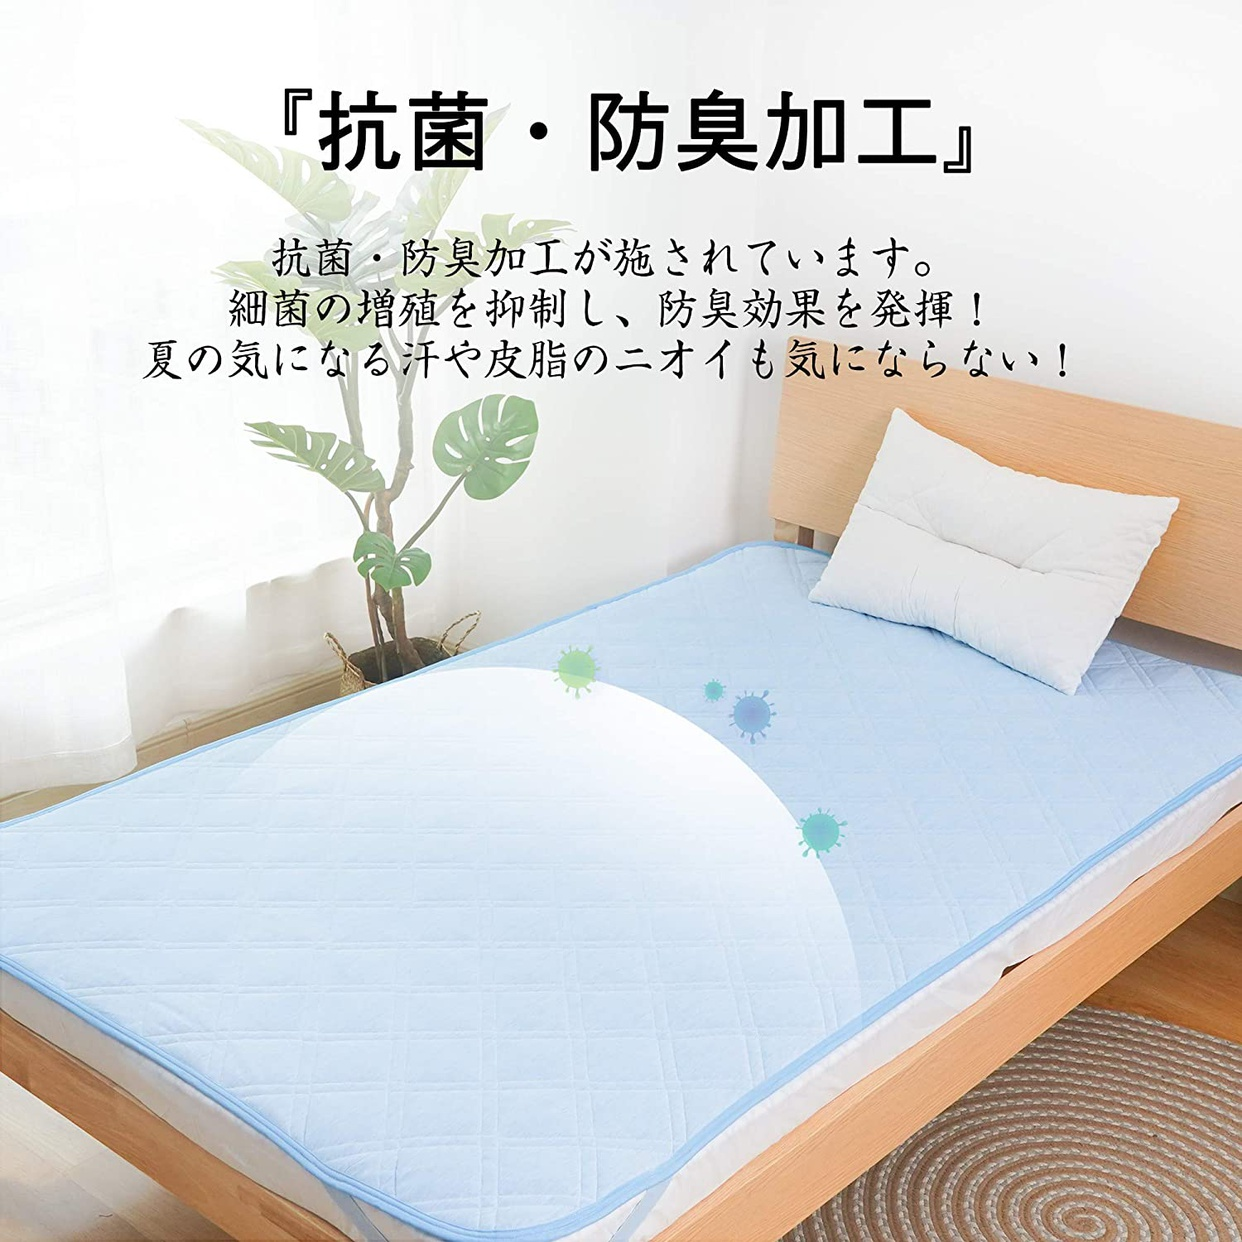 mensu(メンス) ひんやり 敷きパッドの商品画像5